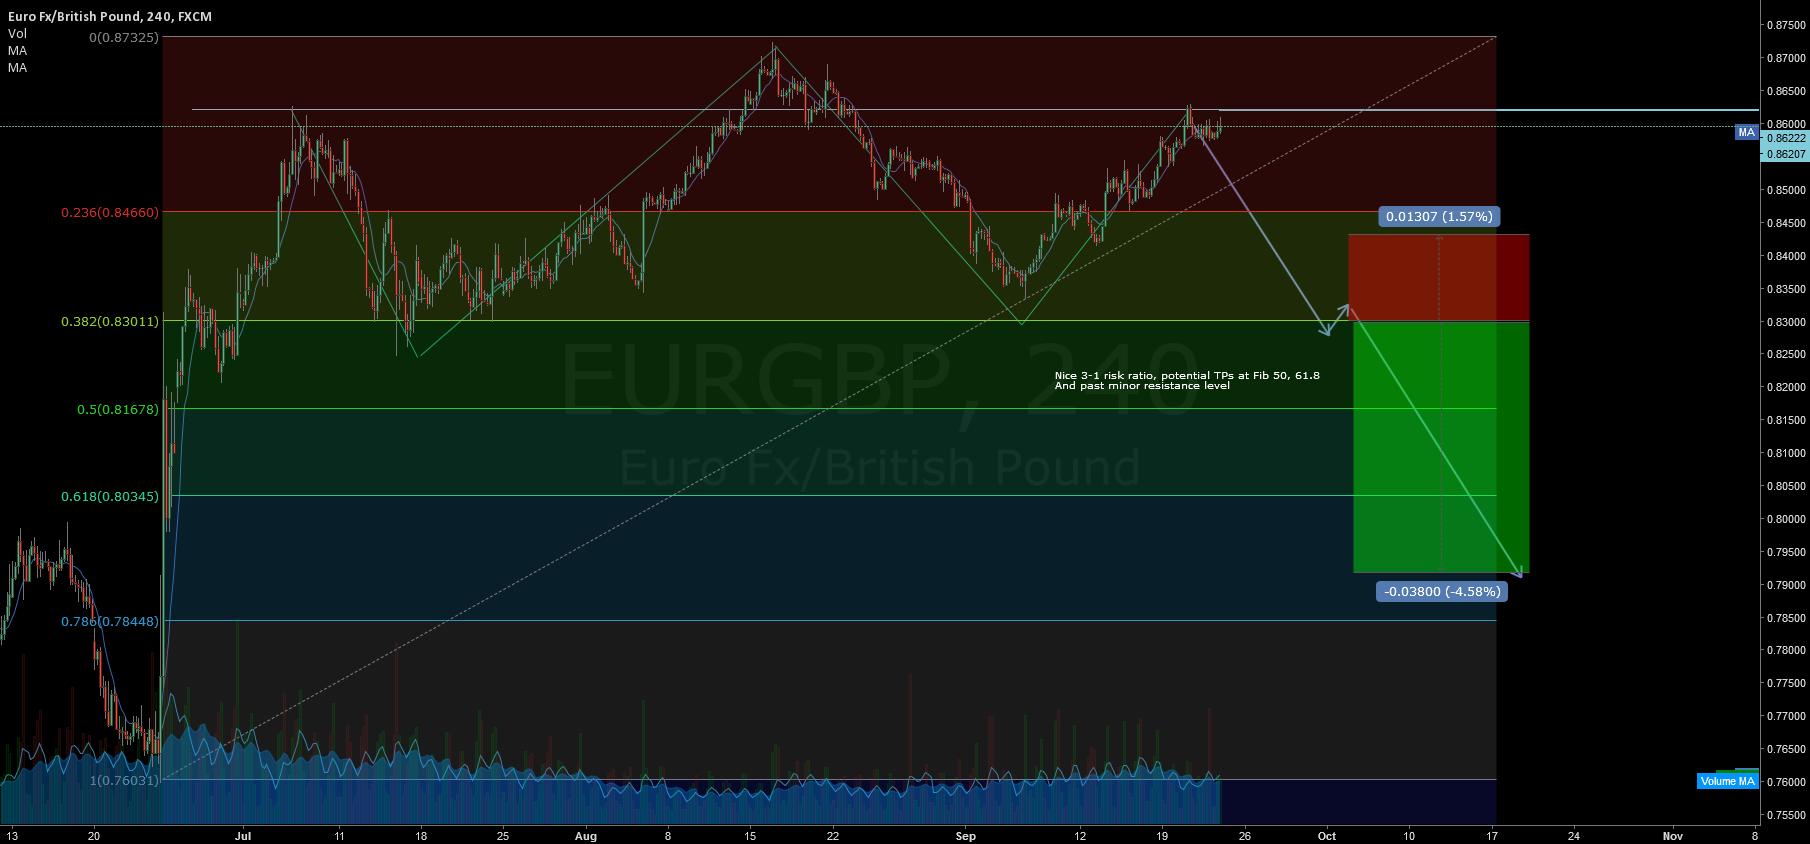 Eur/GBP head&shoulders potential huge move!